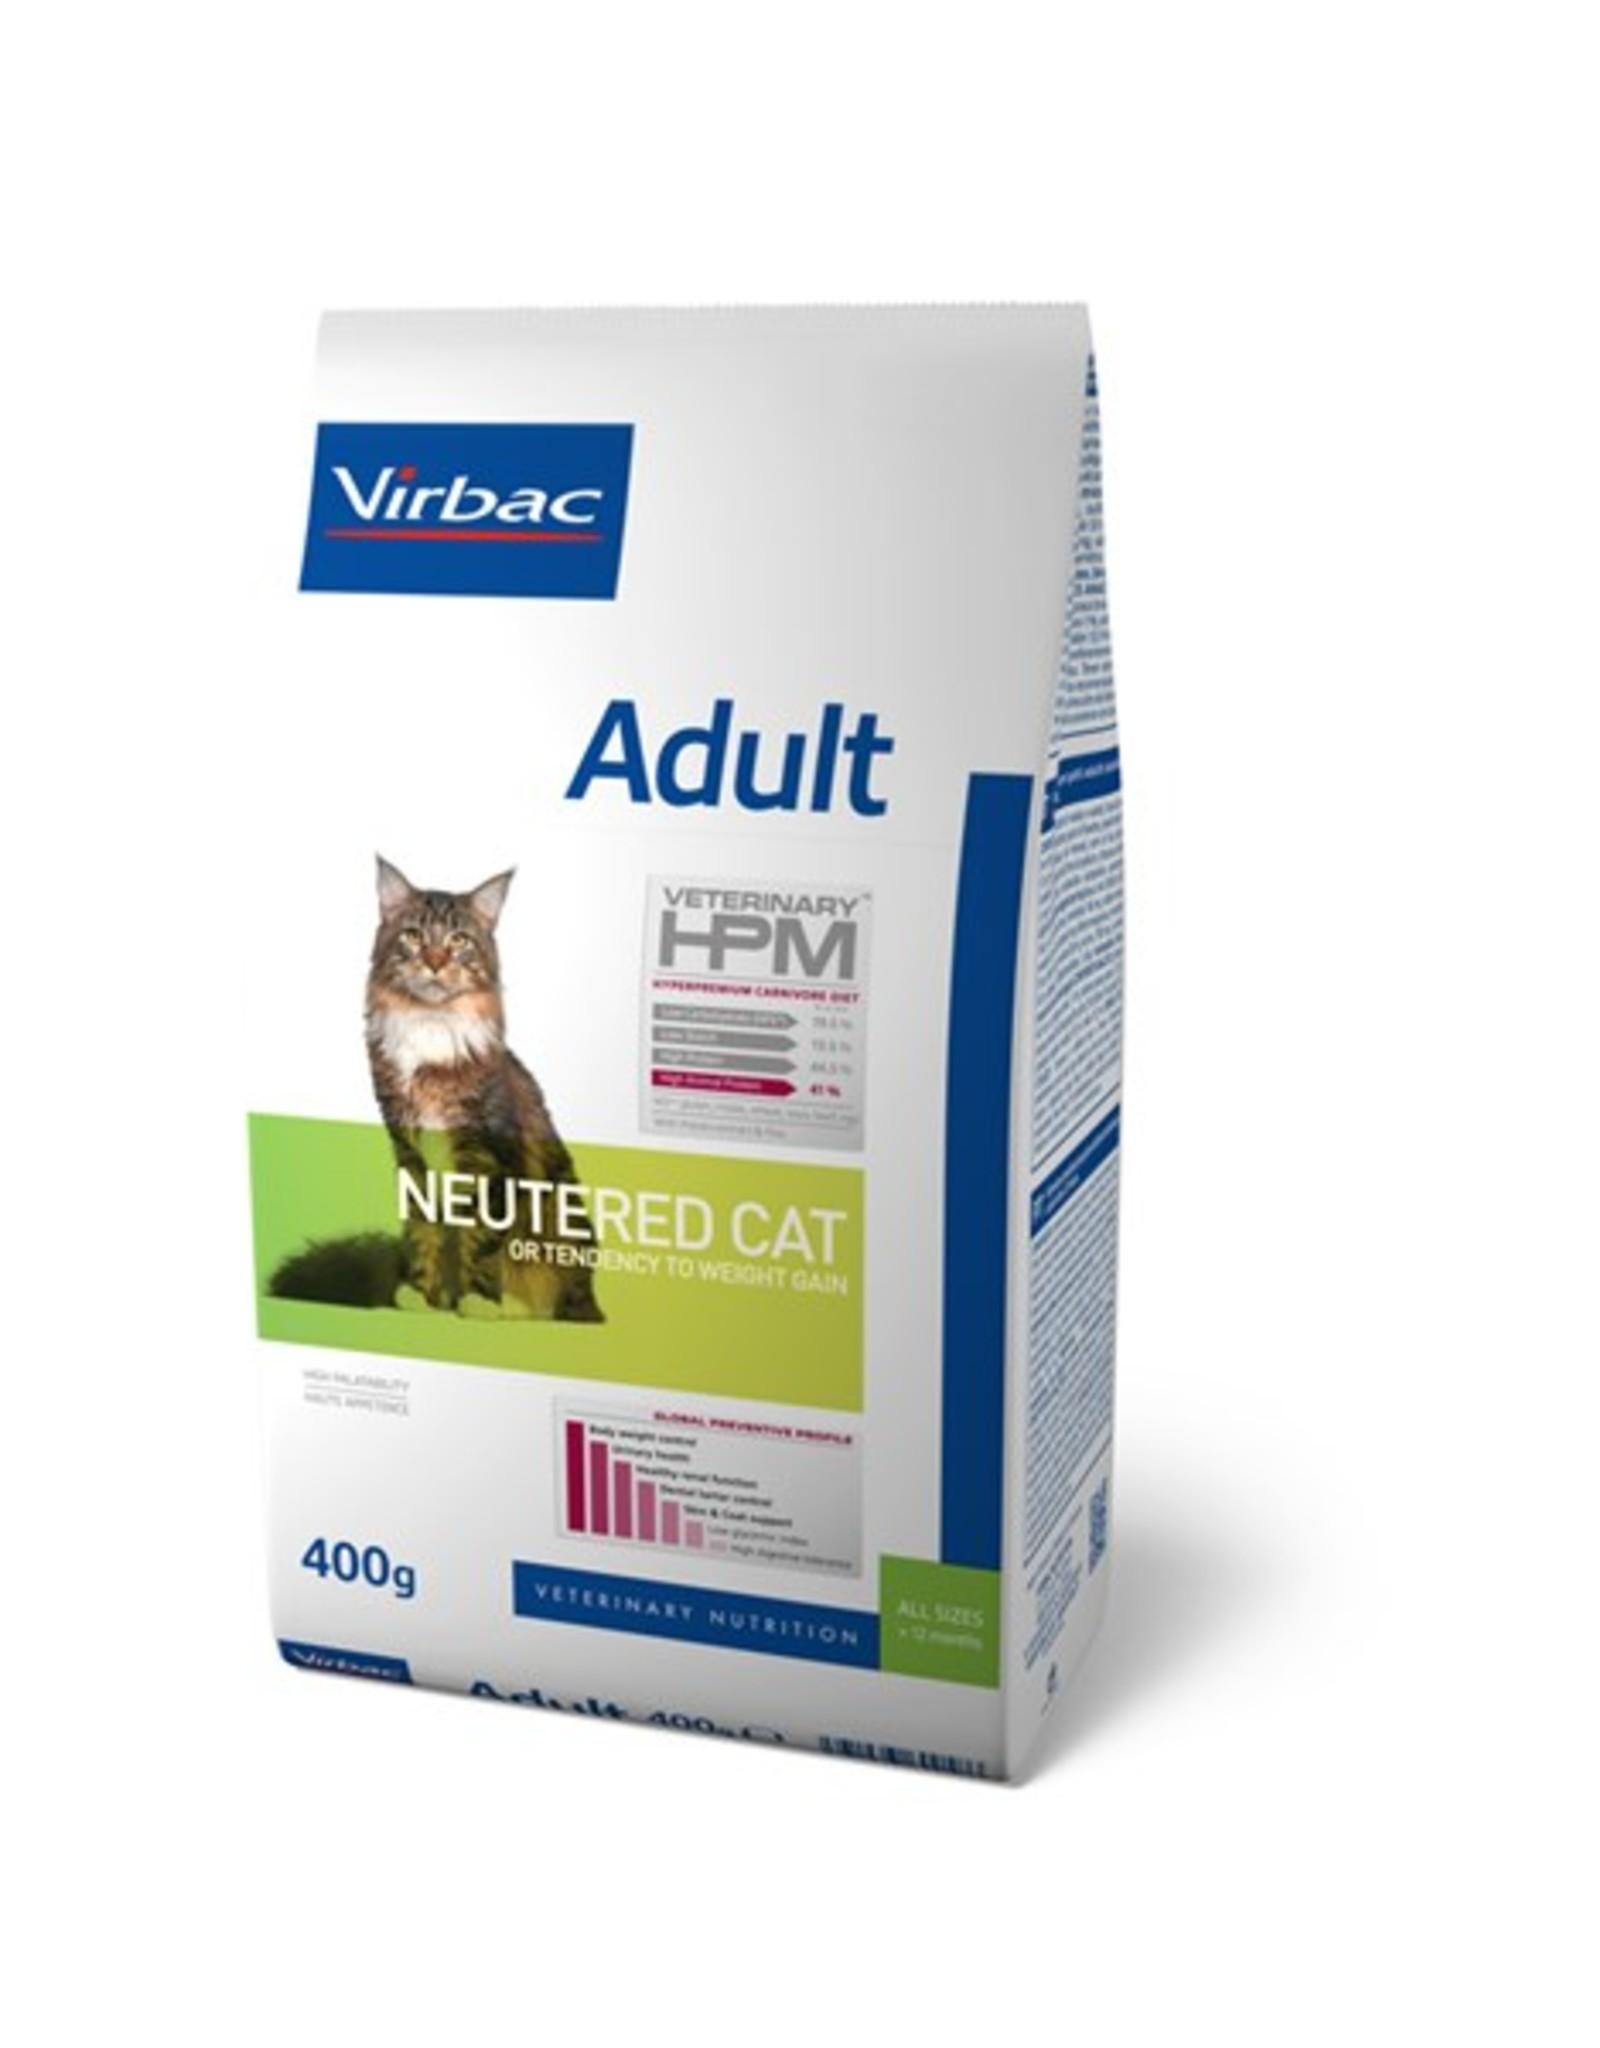 Virbac Virbac Hpm Kat Neutered Adult 0,4kg